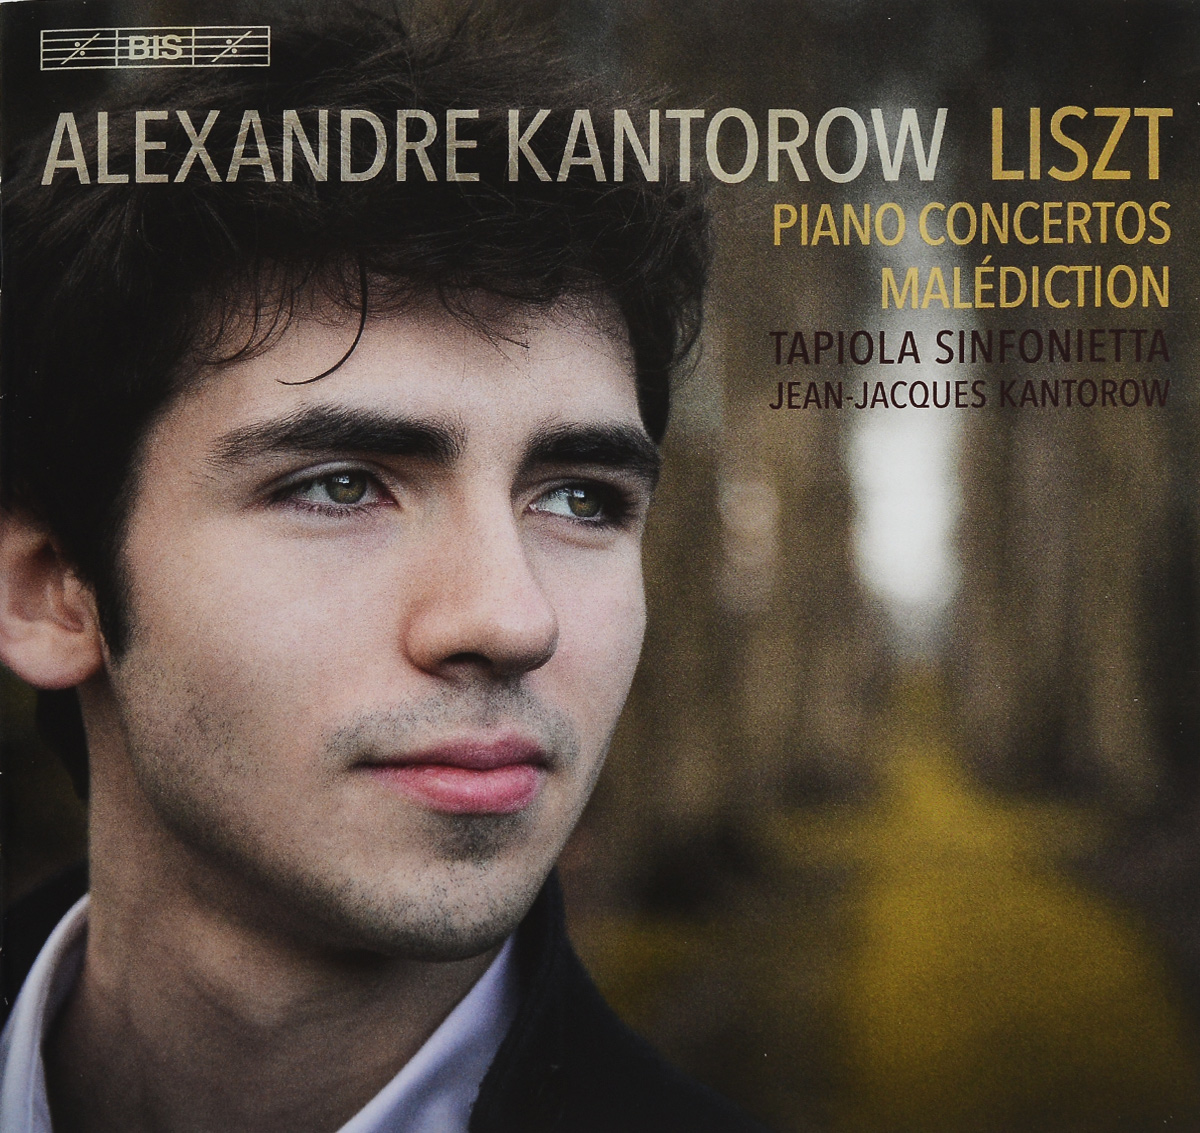 Alexandre Kantorow,Tapiola Sinfonietta,Жан-Жак Кантаров Alexandre Kantorow. Liszt. Piano Concertos. Malediction (SACD)